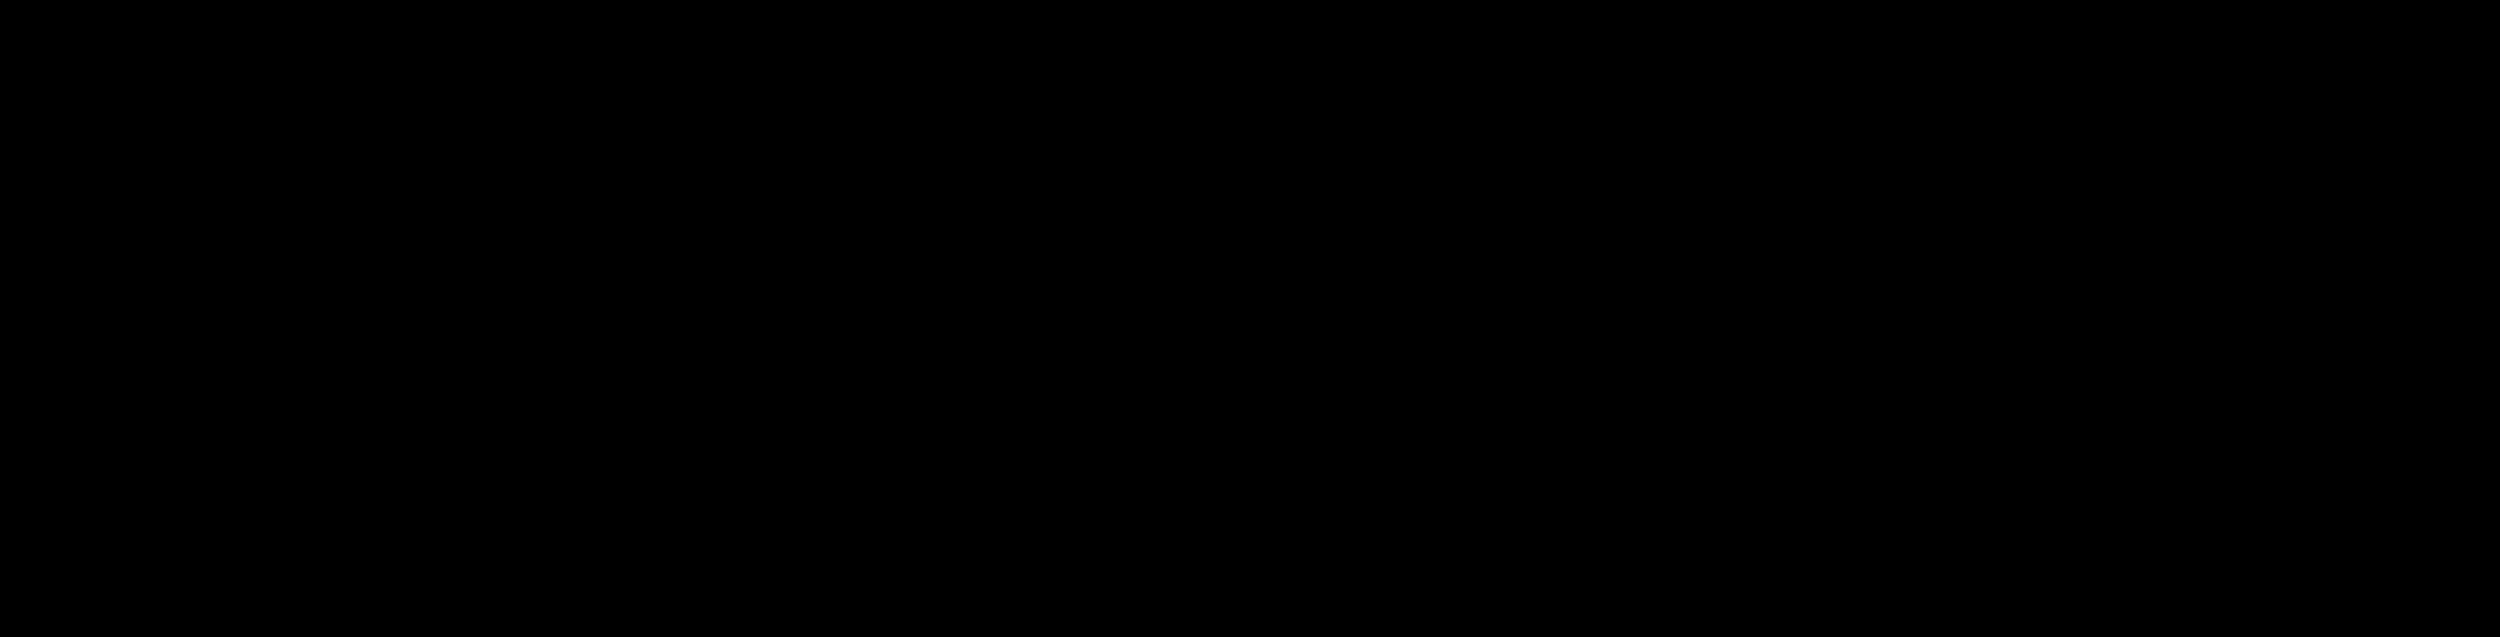 ClearwaterRiverCasino-logo.png